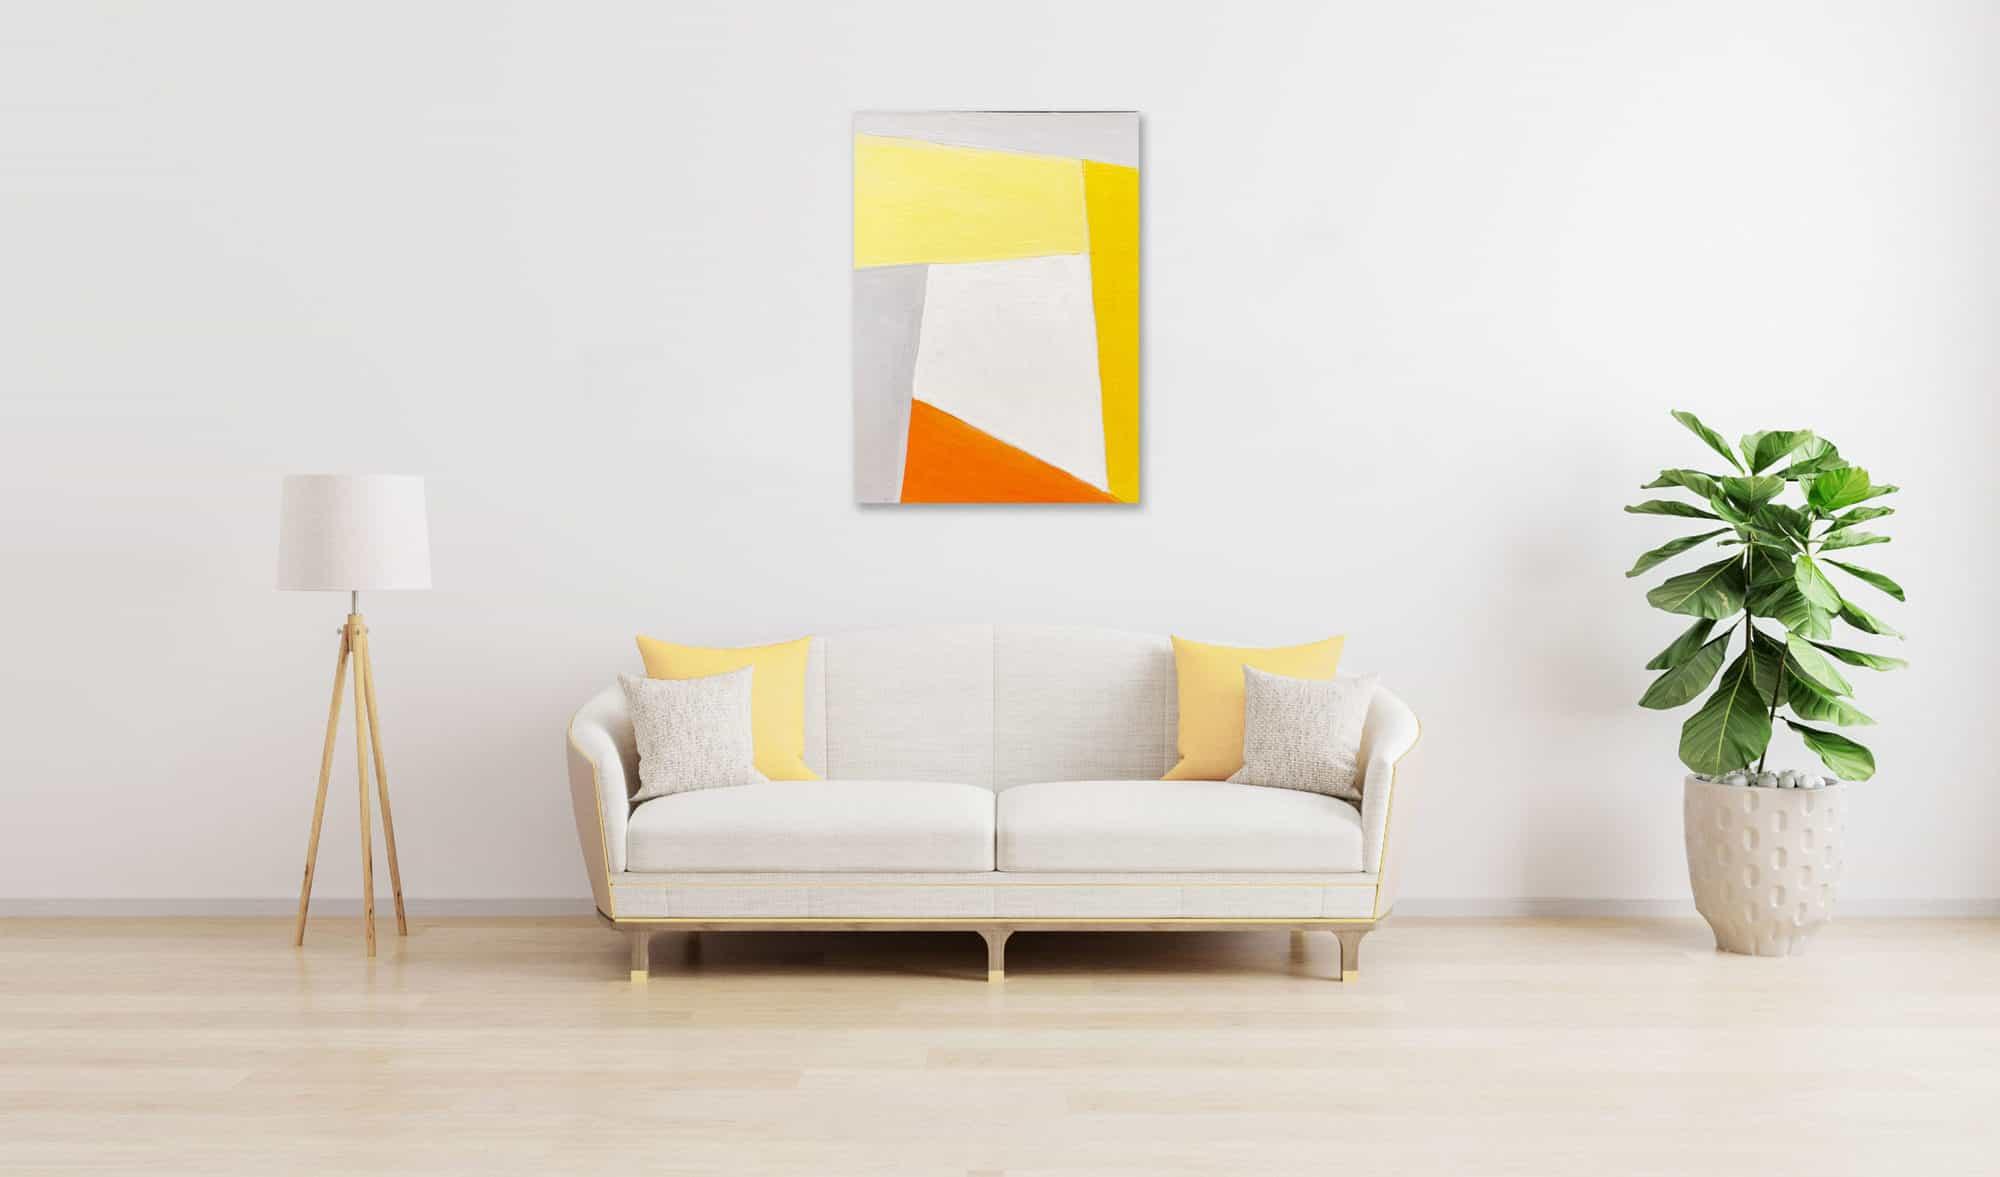 Acrylbild konkret Orange wandbild